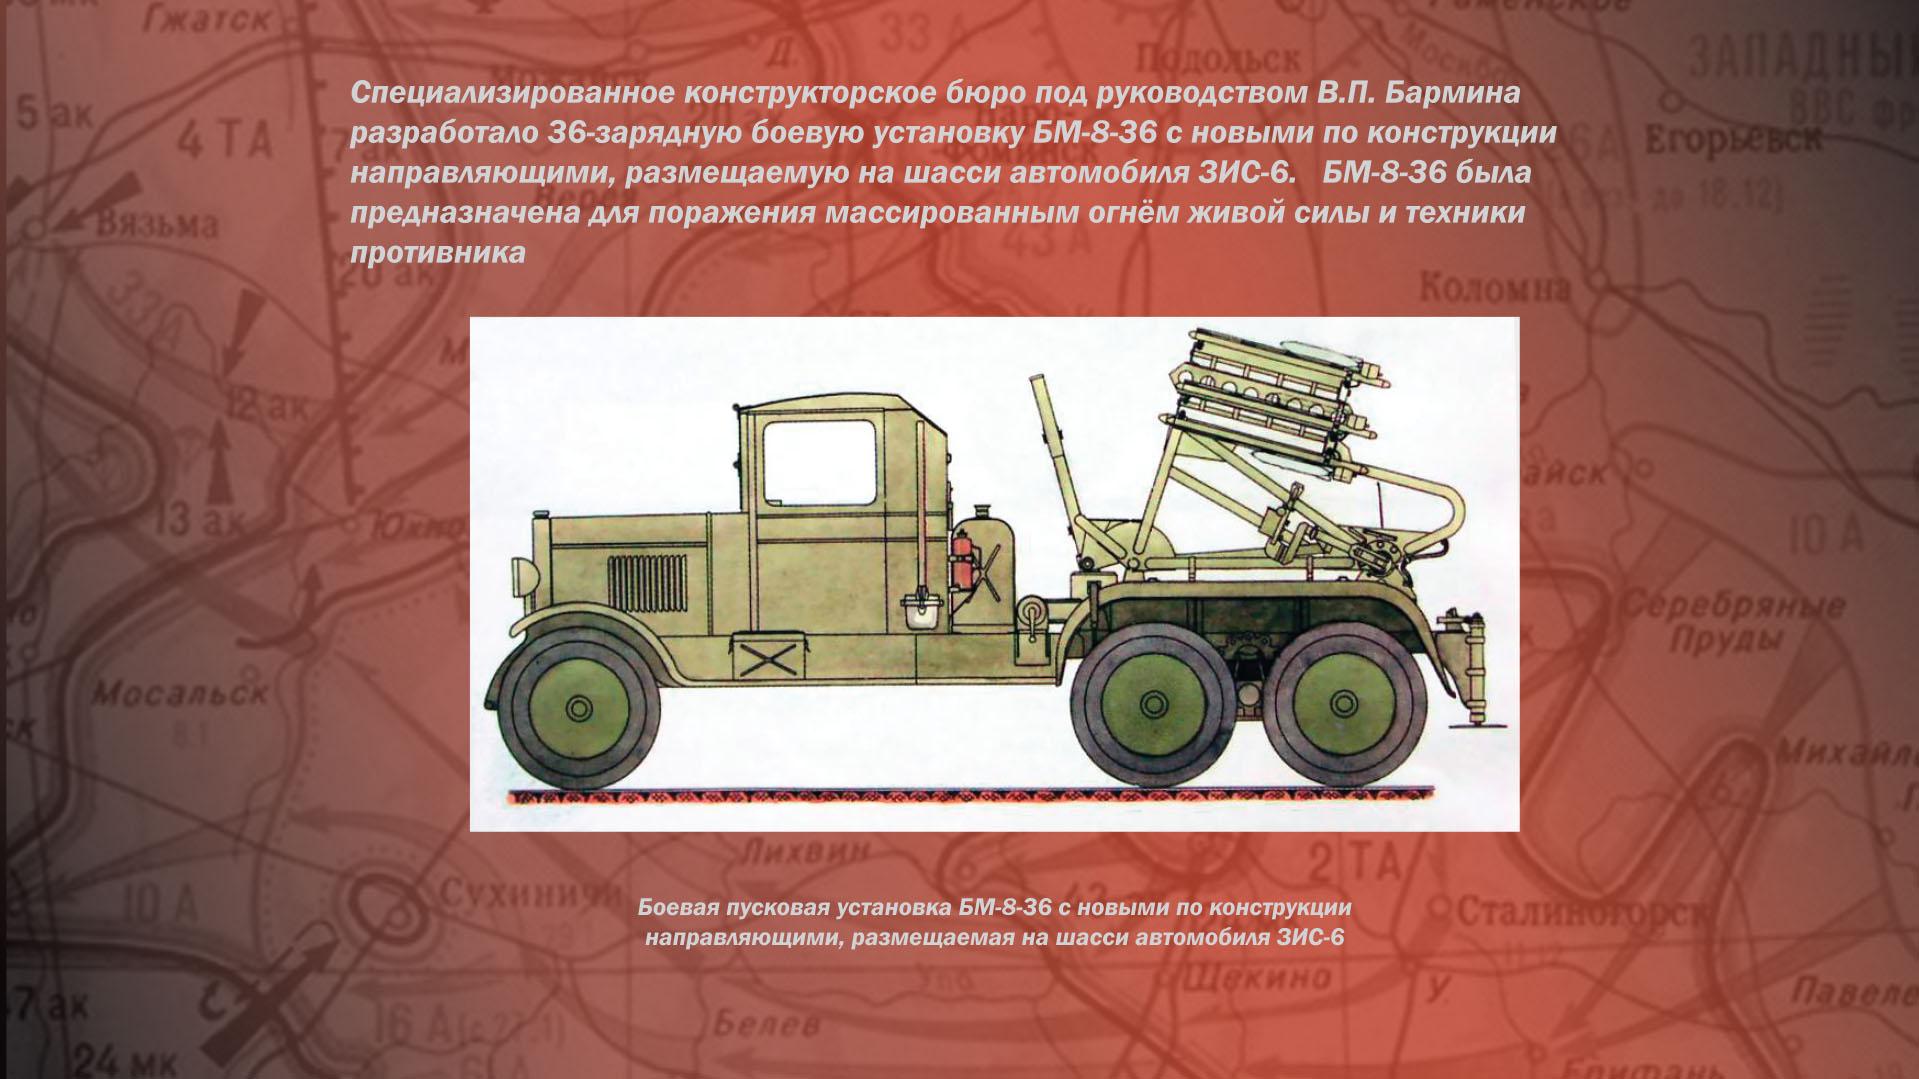 БМ-8-36 на шасси автомобиля ЗИС-6